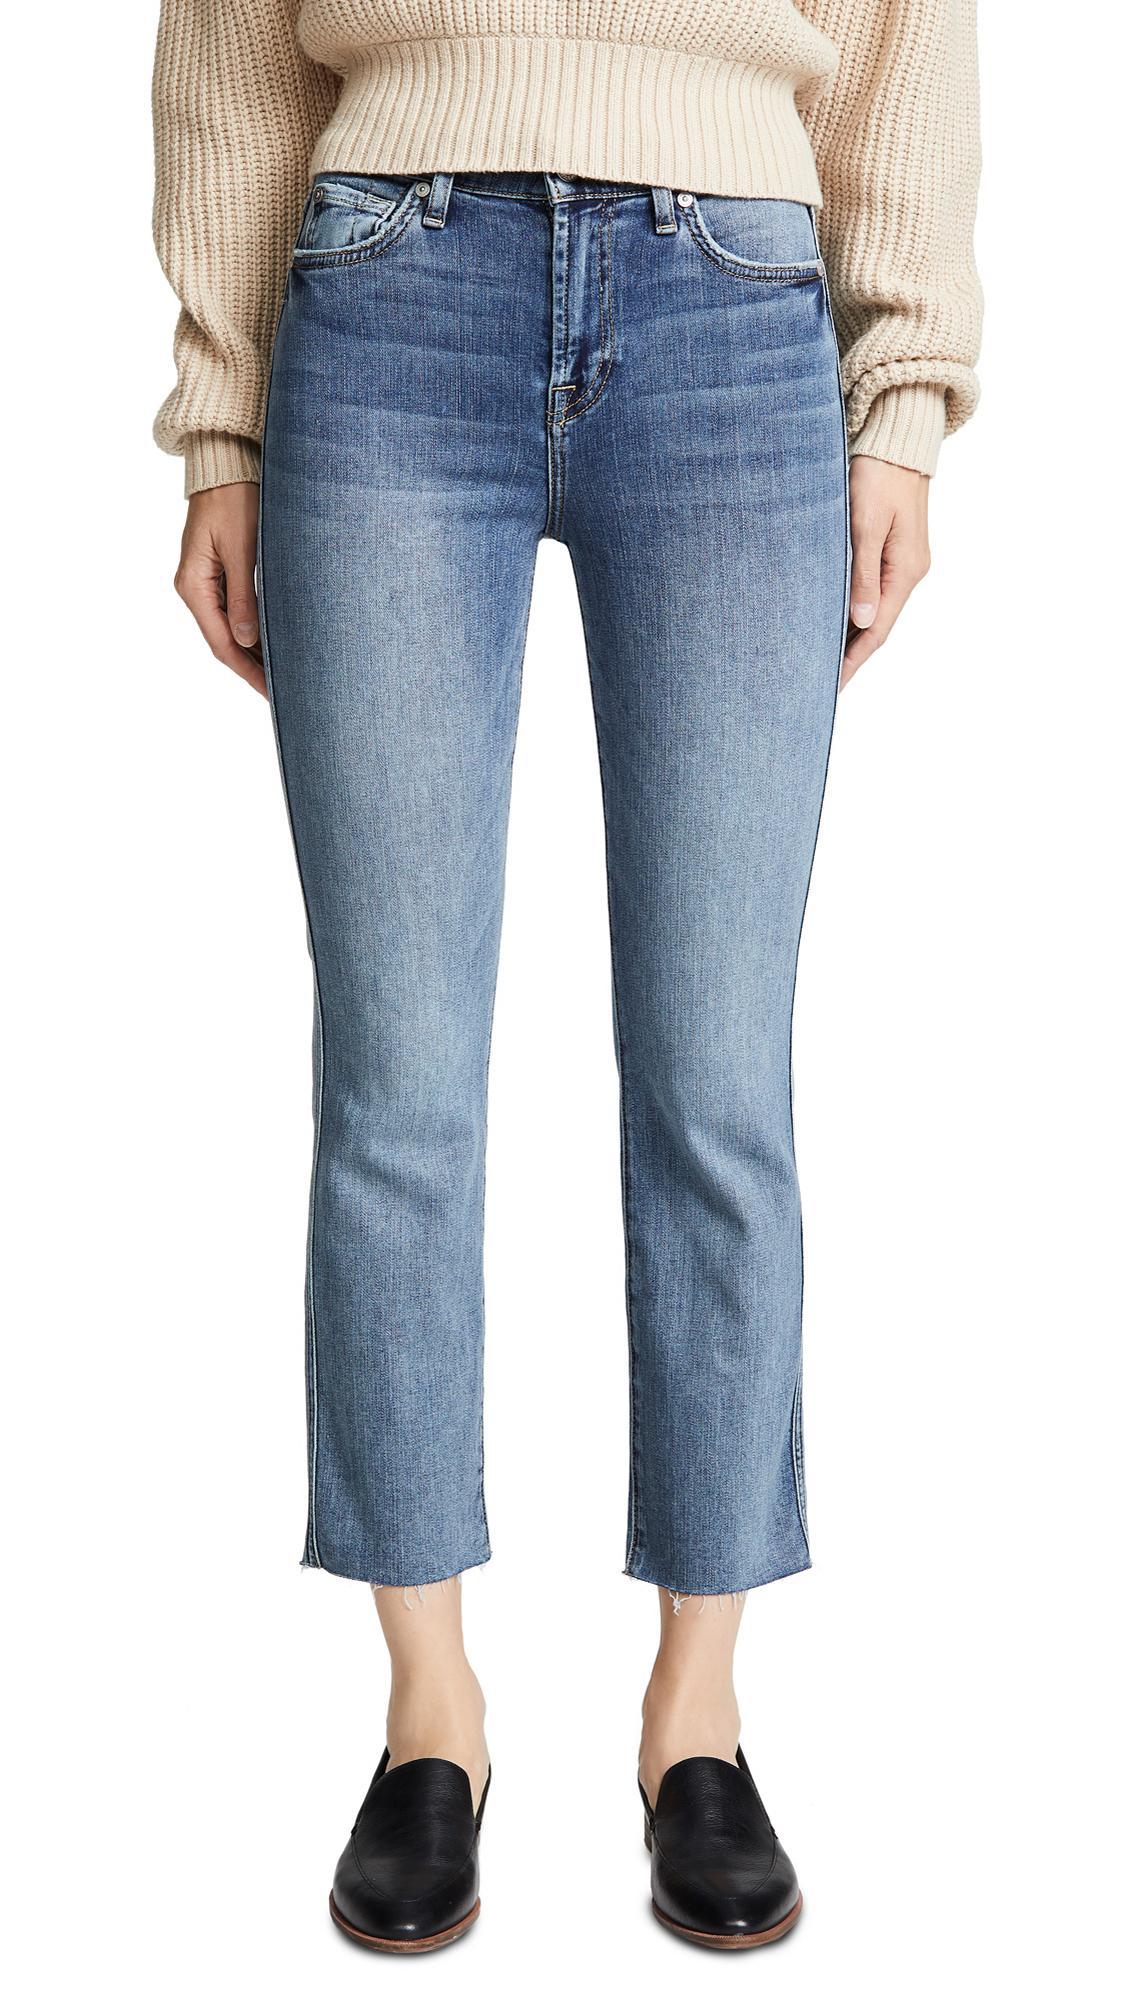 9faf9e96baa 7 For All Mankind Edie B(Air) Authentic Raw Hem Jeans In B(Air ...